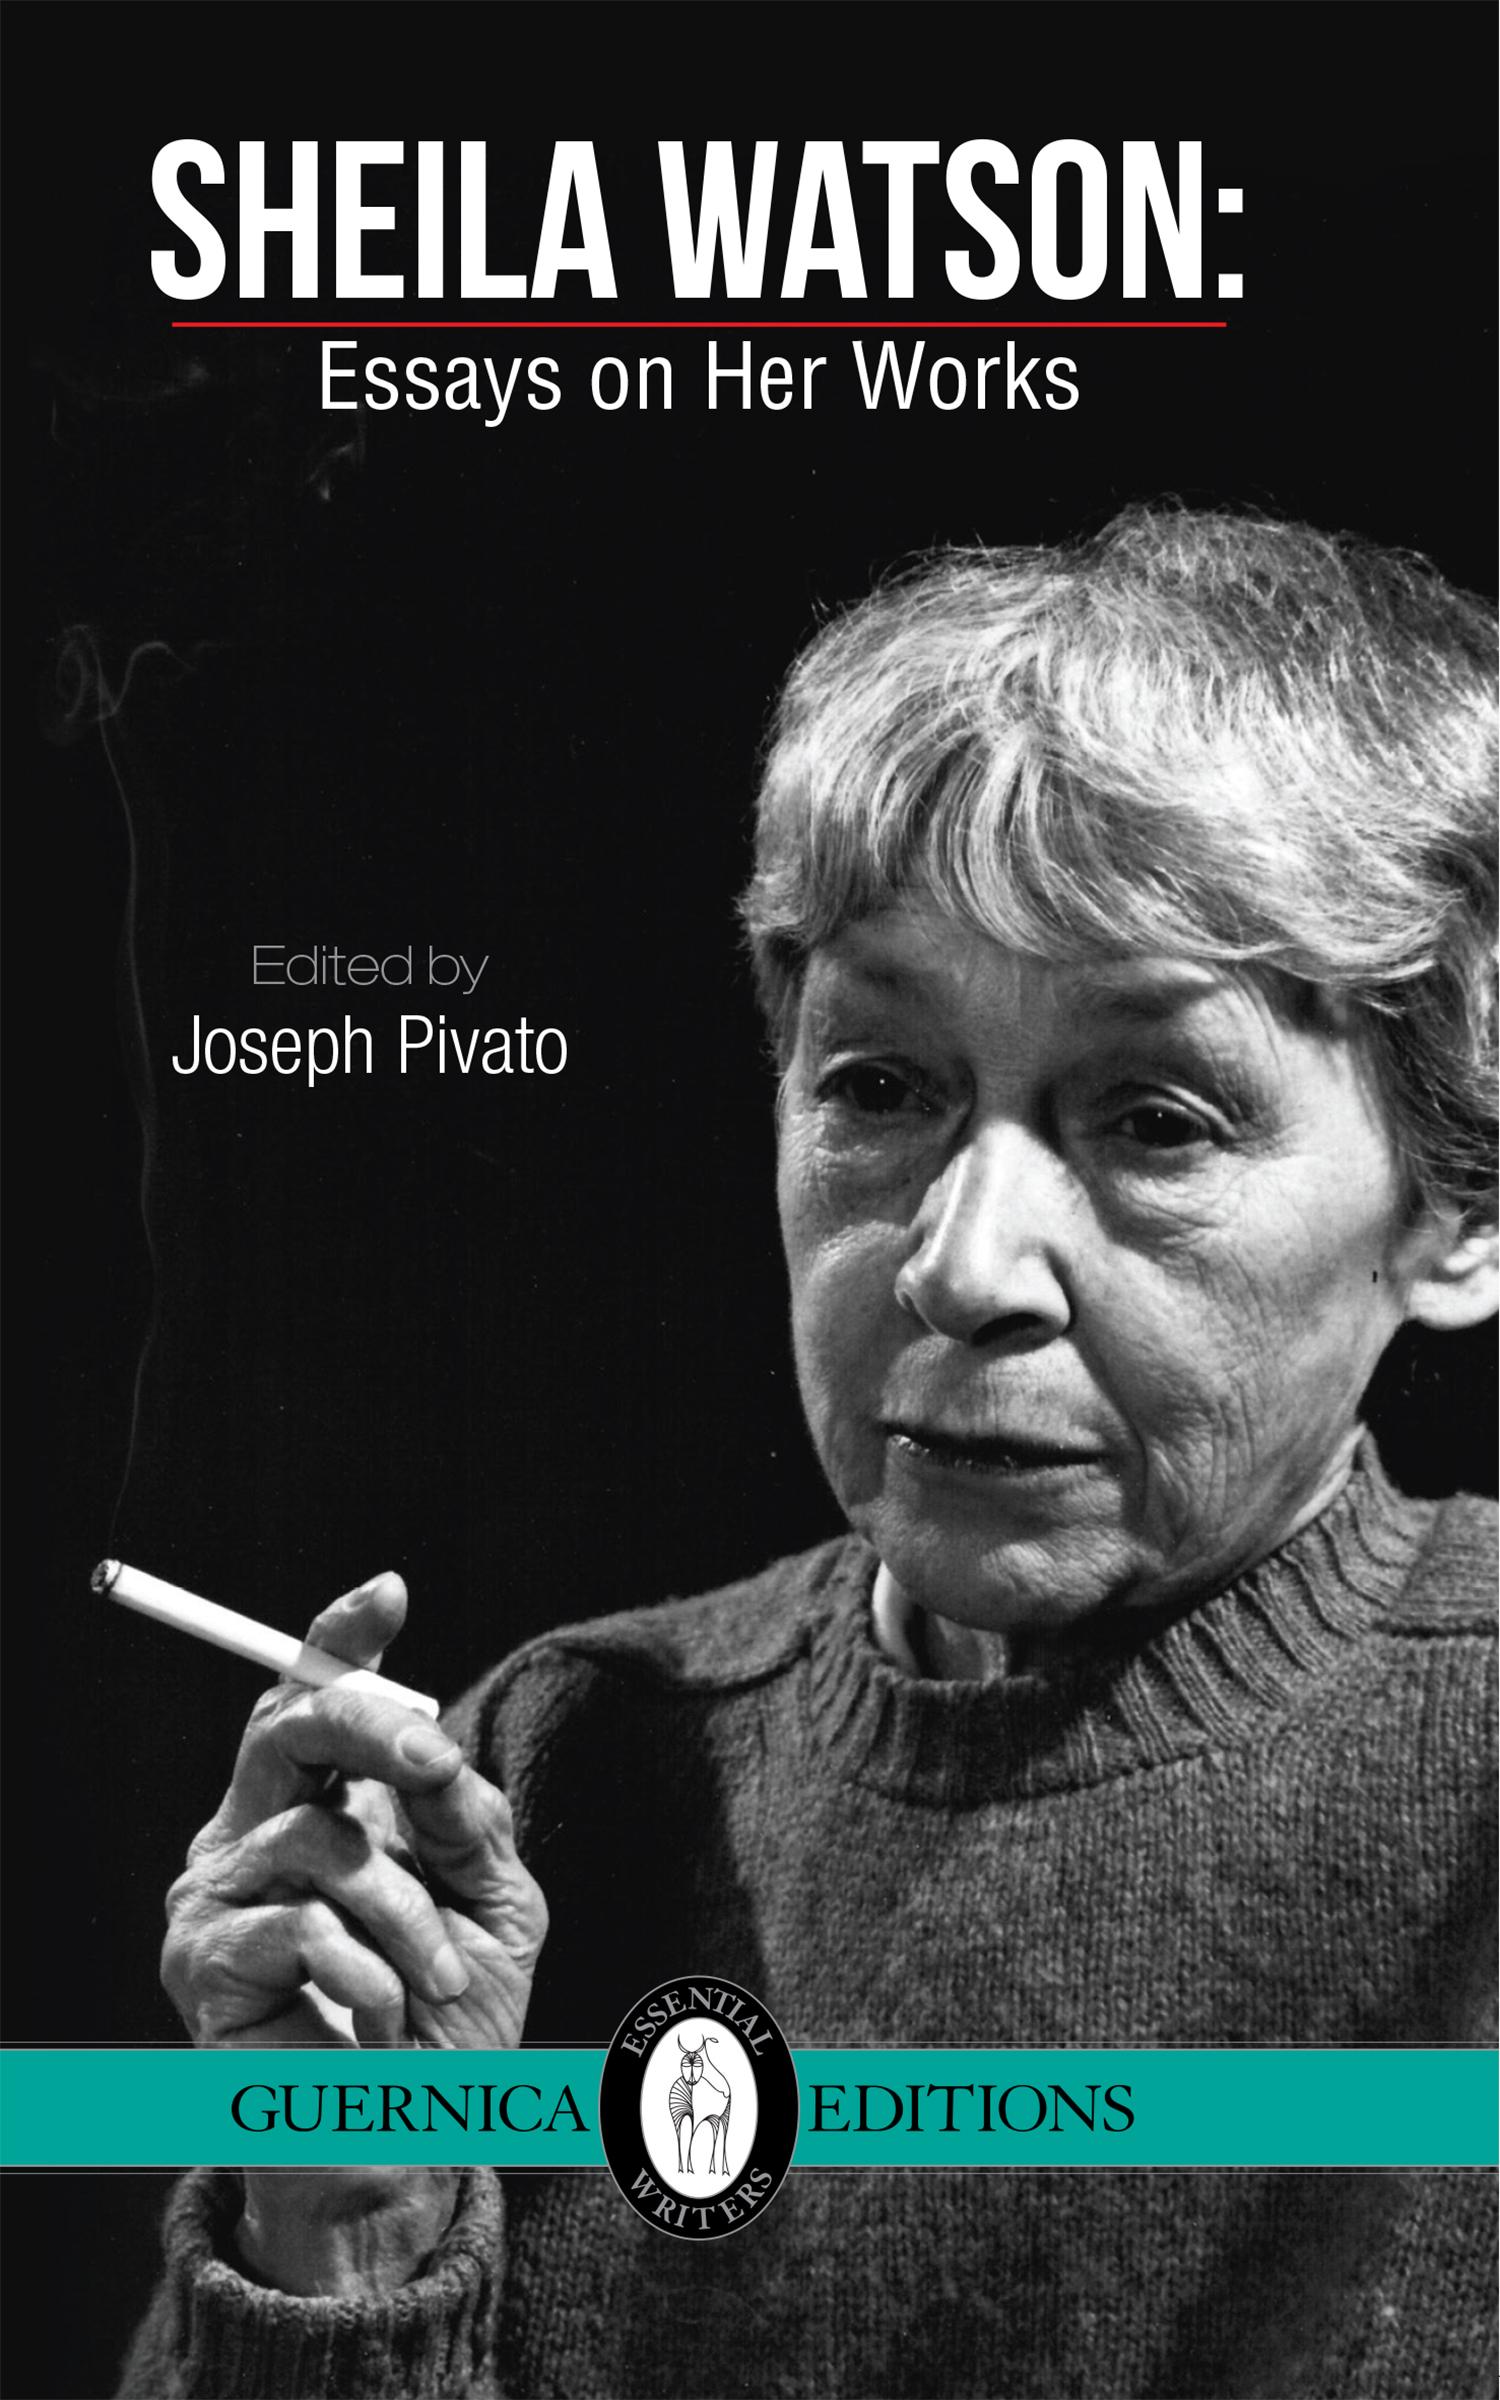 Sheila Watson: Essays on Her Works